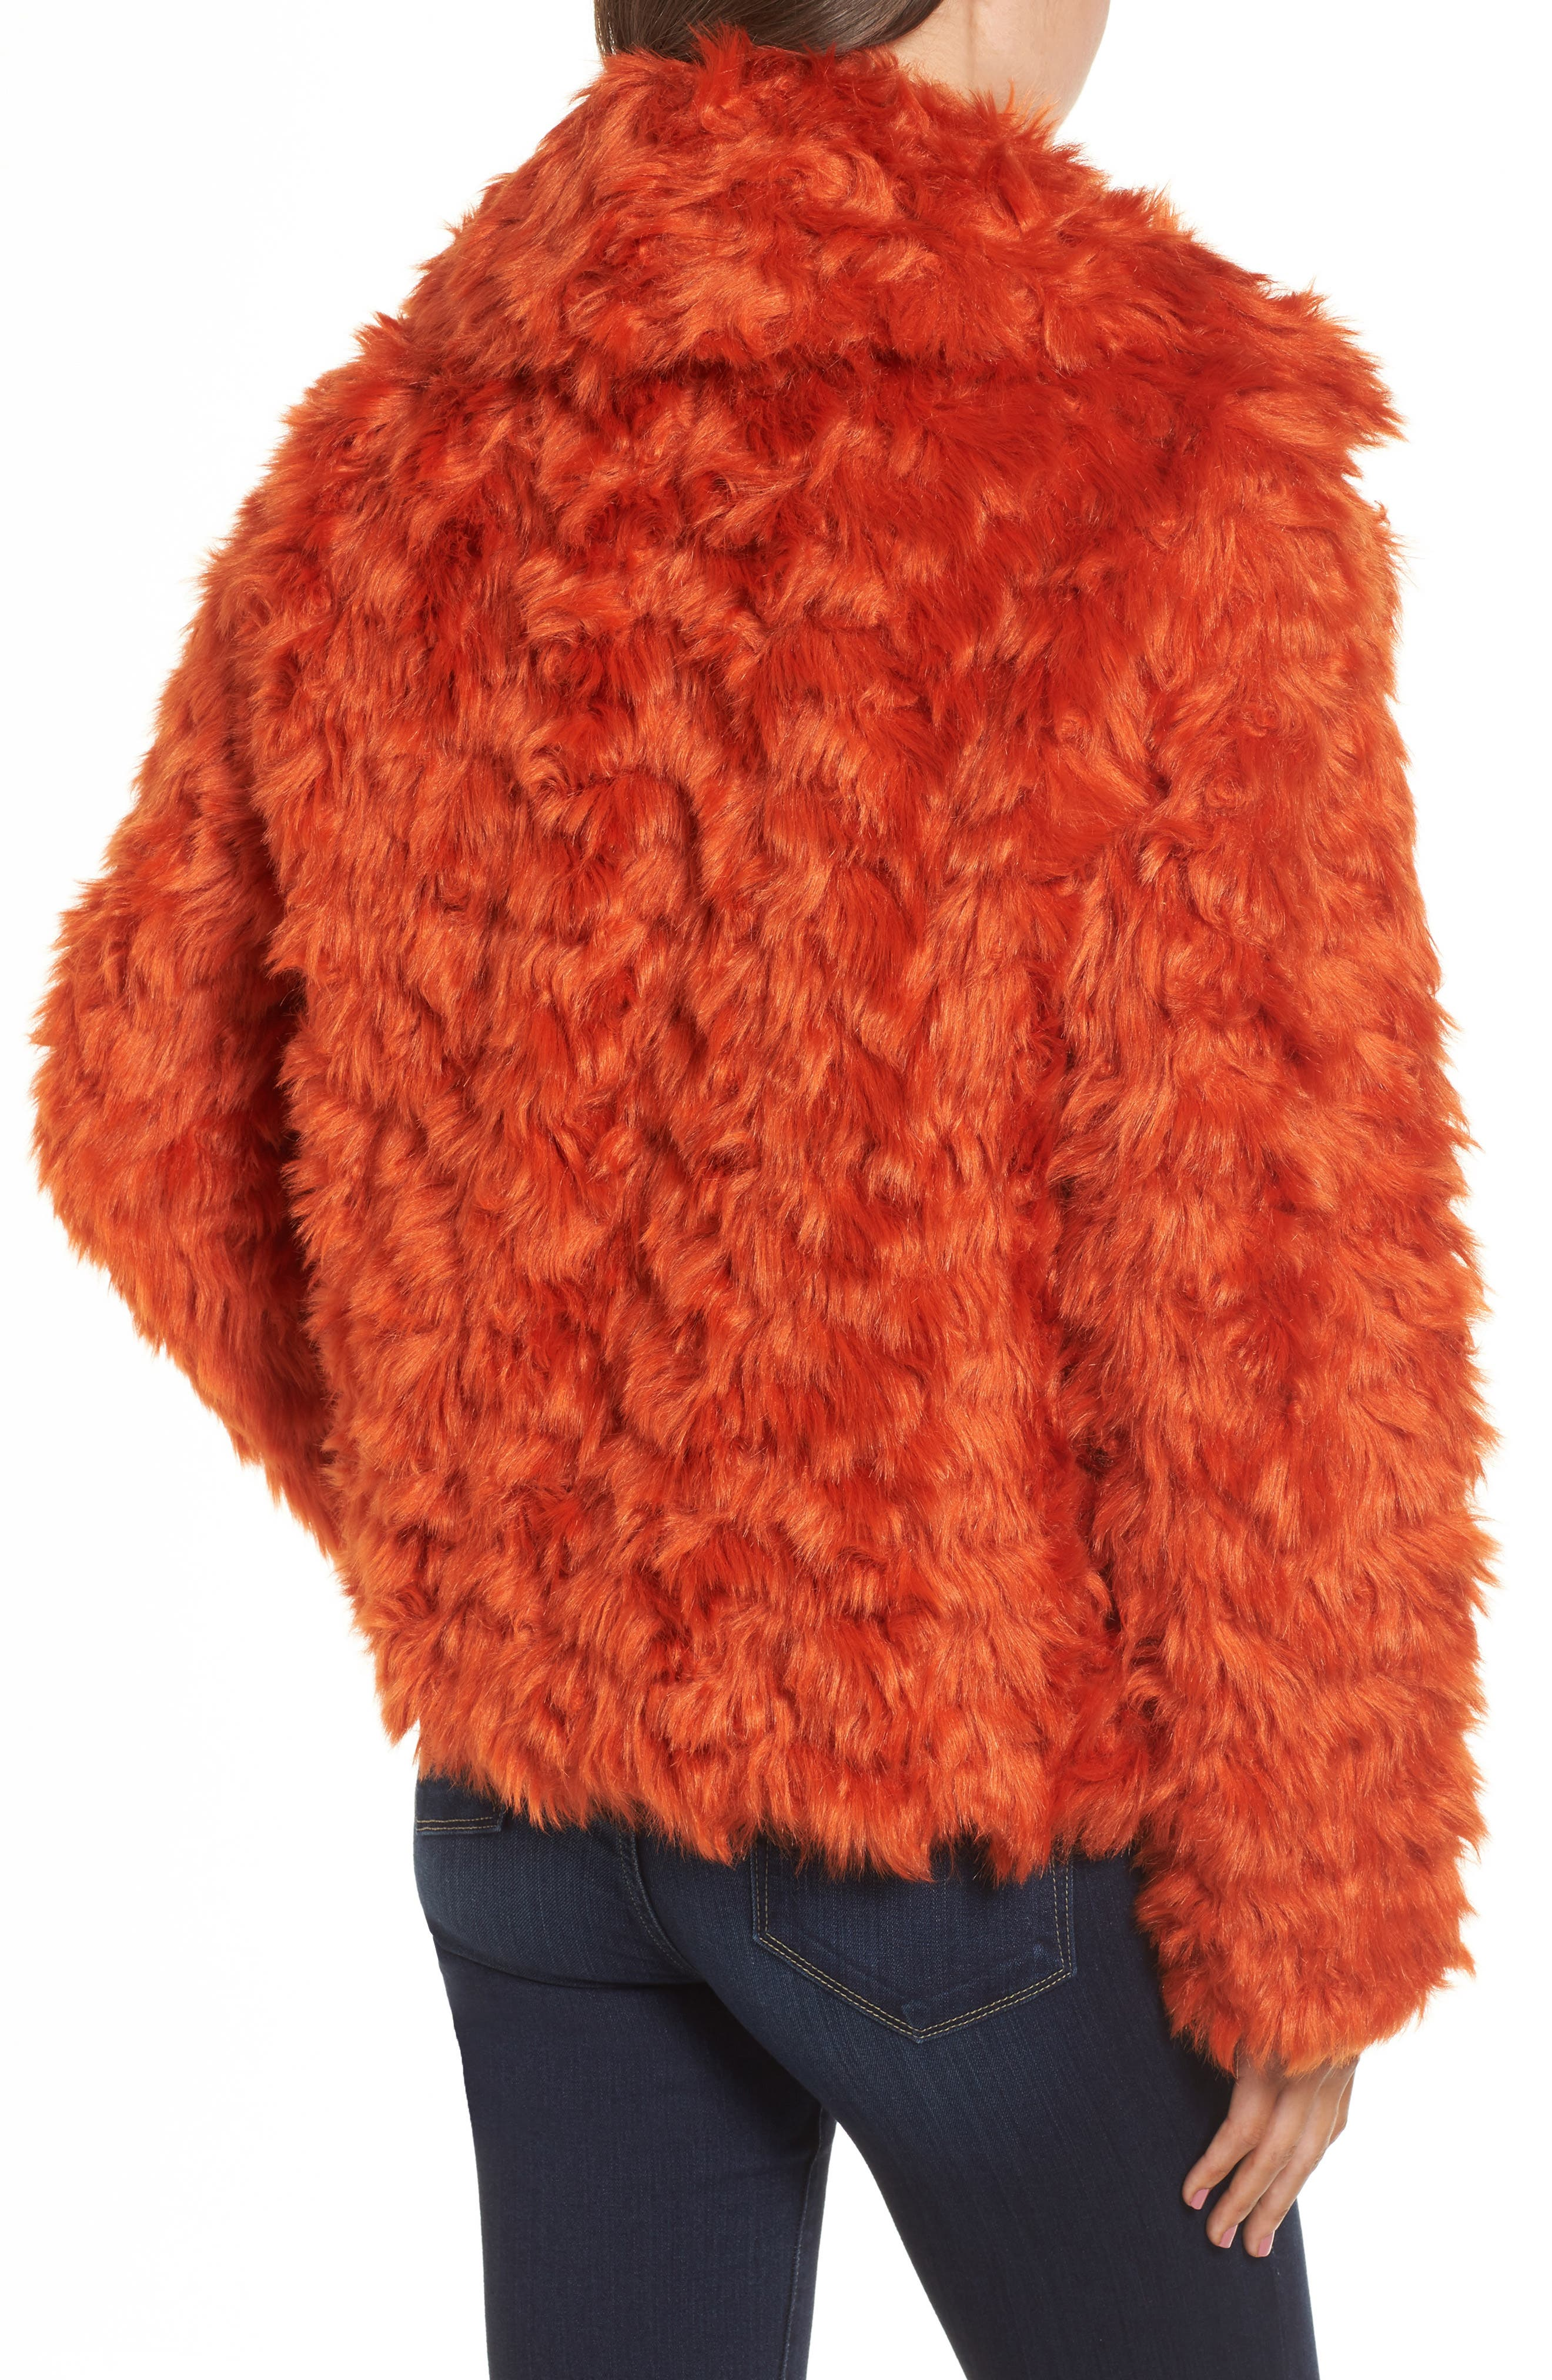 Curly Faux Fur Jacket,                             Alternate thumbnail 2, color,                             800